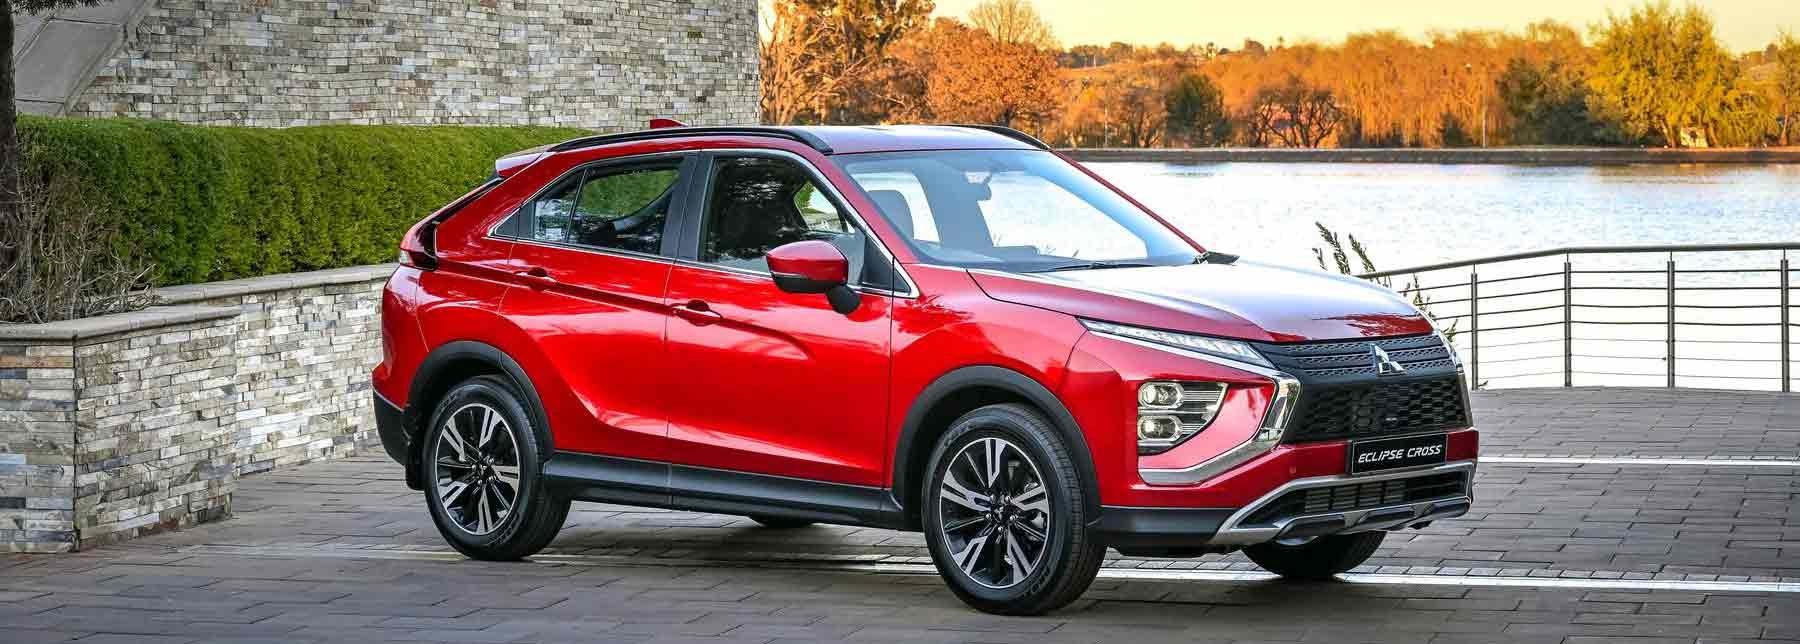 Mitsubishi launches second generation Eclipse Cross